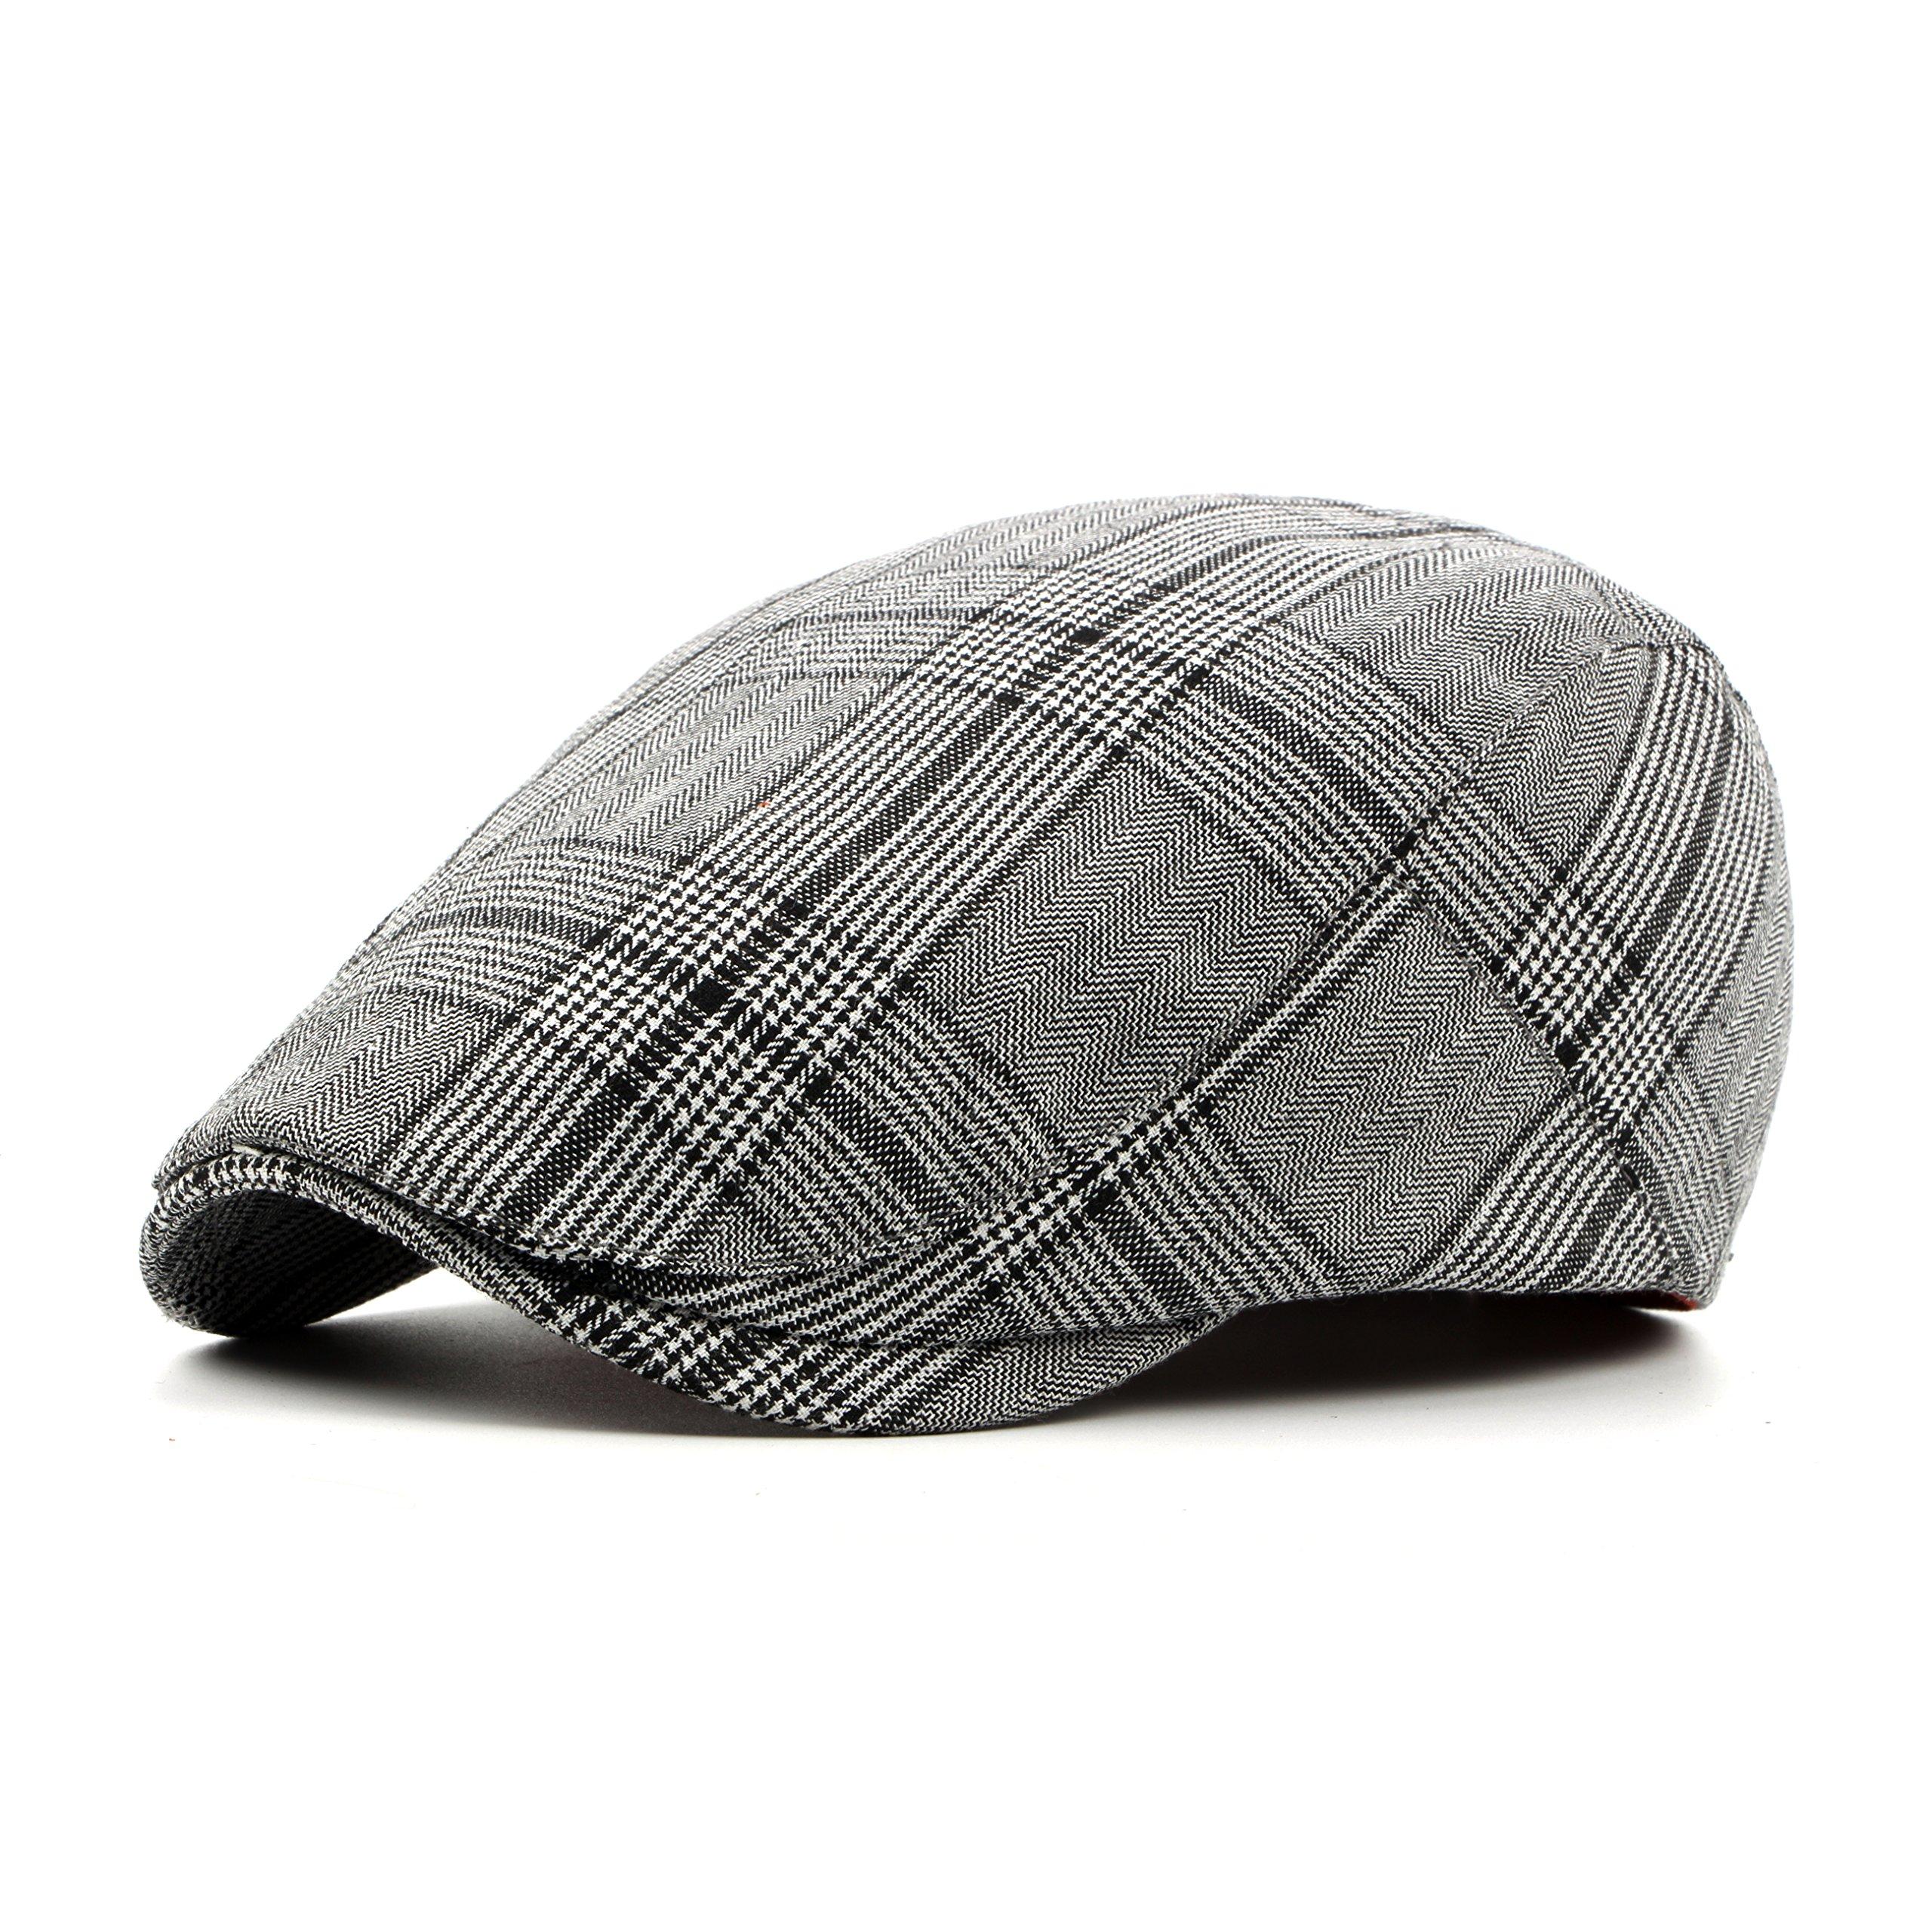 ... c3392 217aa Mens Flat Hats - Saffron Indian Cuisine fresh styles ... 3aebb8c0cf7